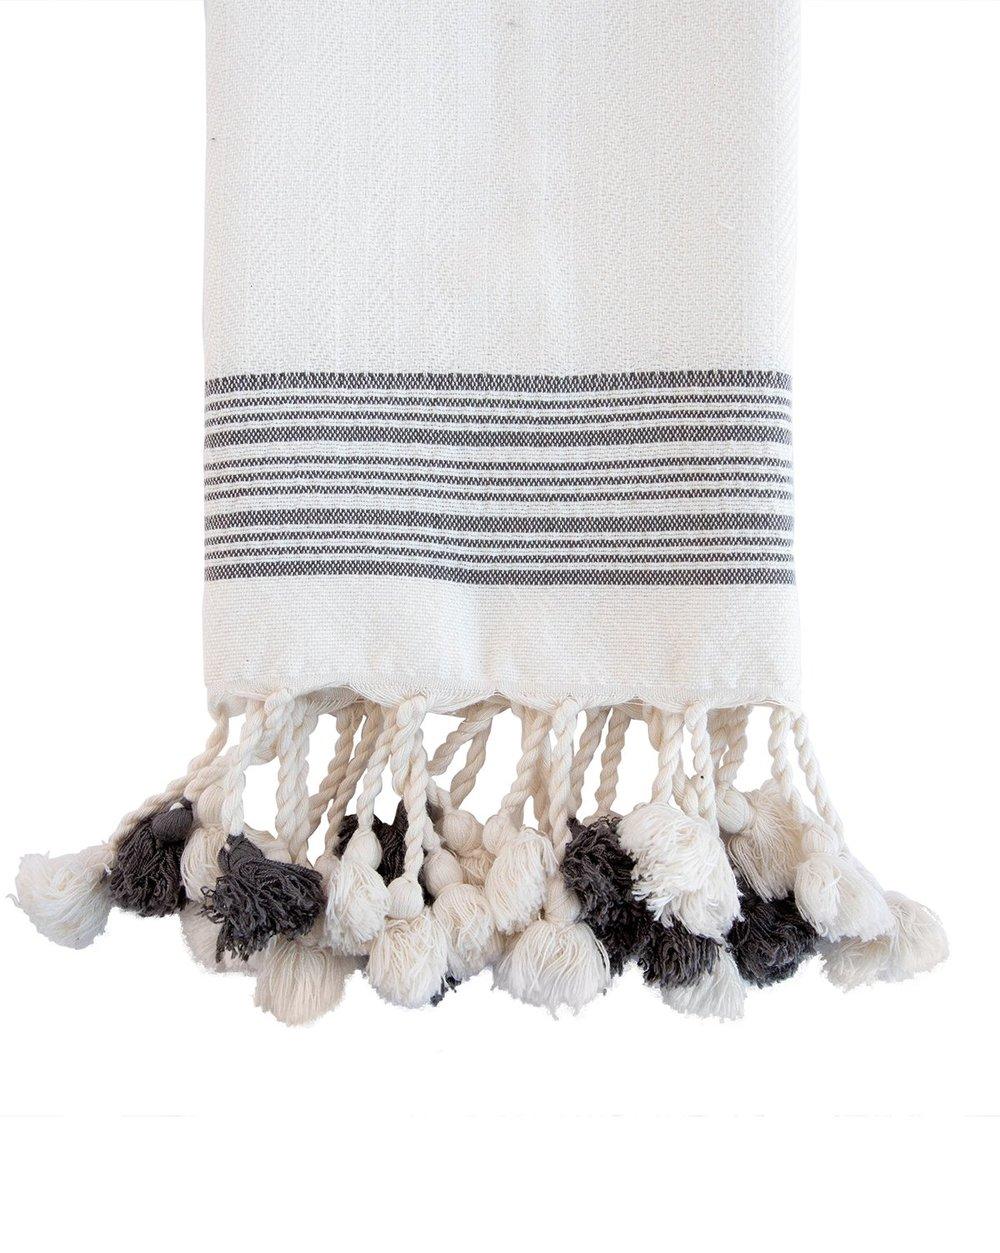 Hadleigh_Hand_Towel_6.jpg